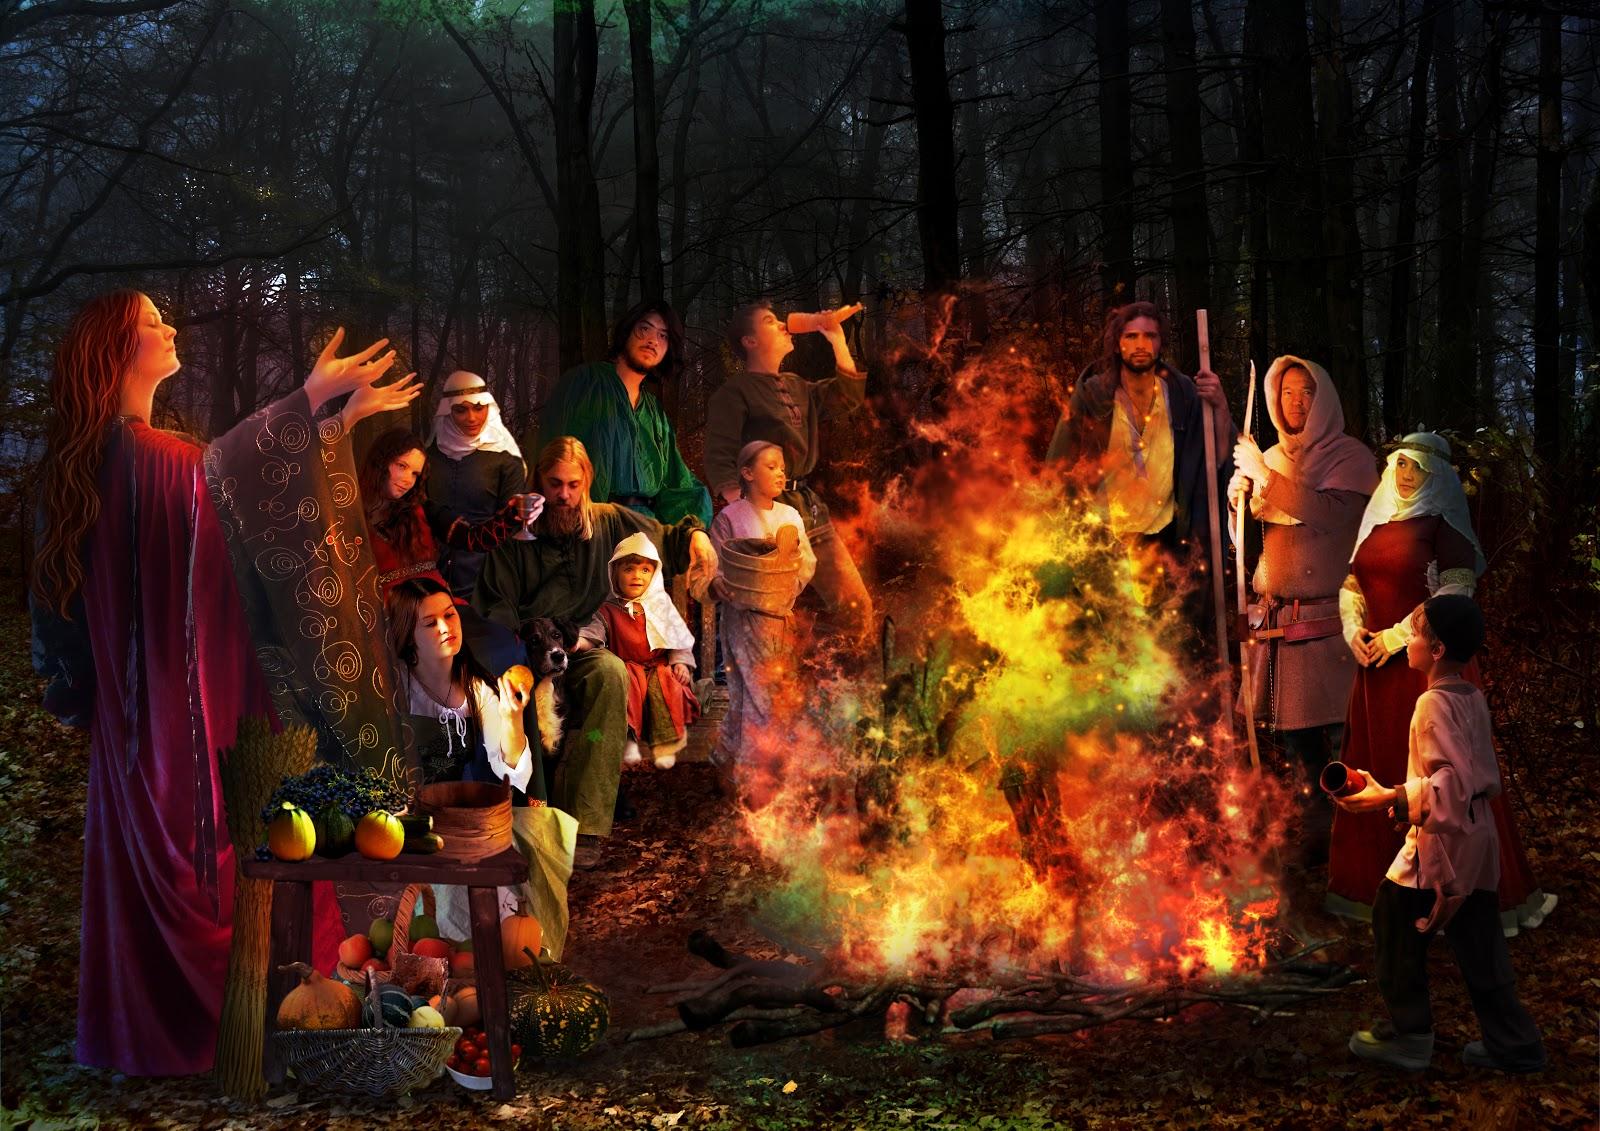 samhain_bonfire_by_digimaree-d4doddy